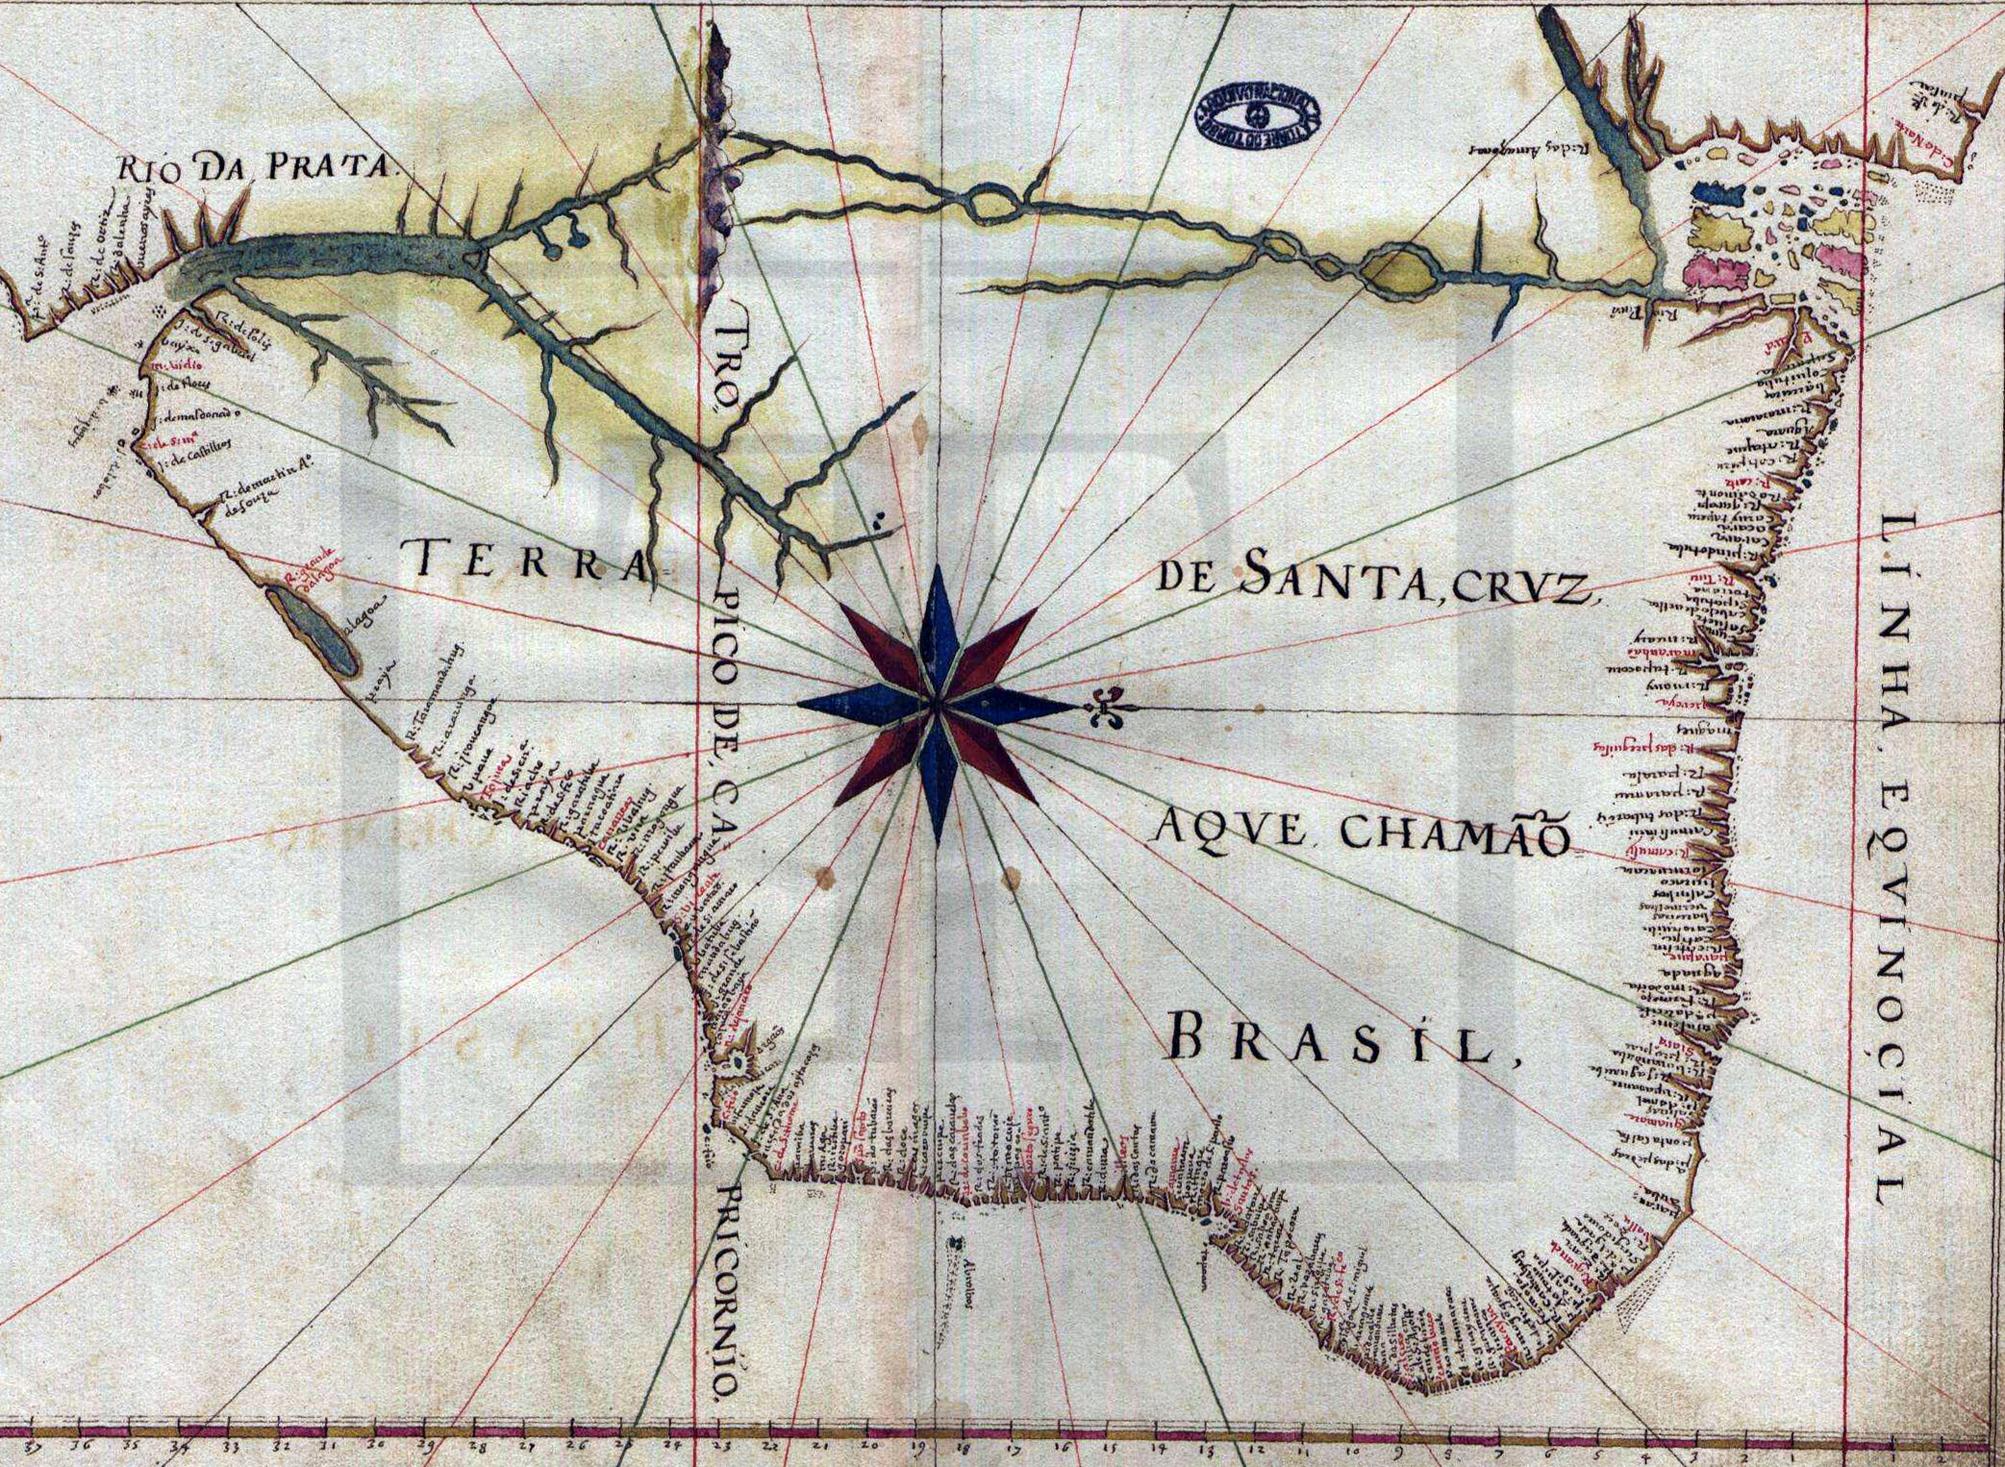 Atlas de Albernaz, de 1640.